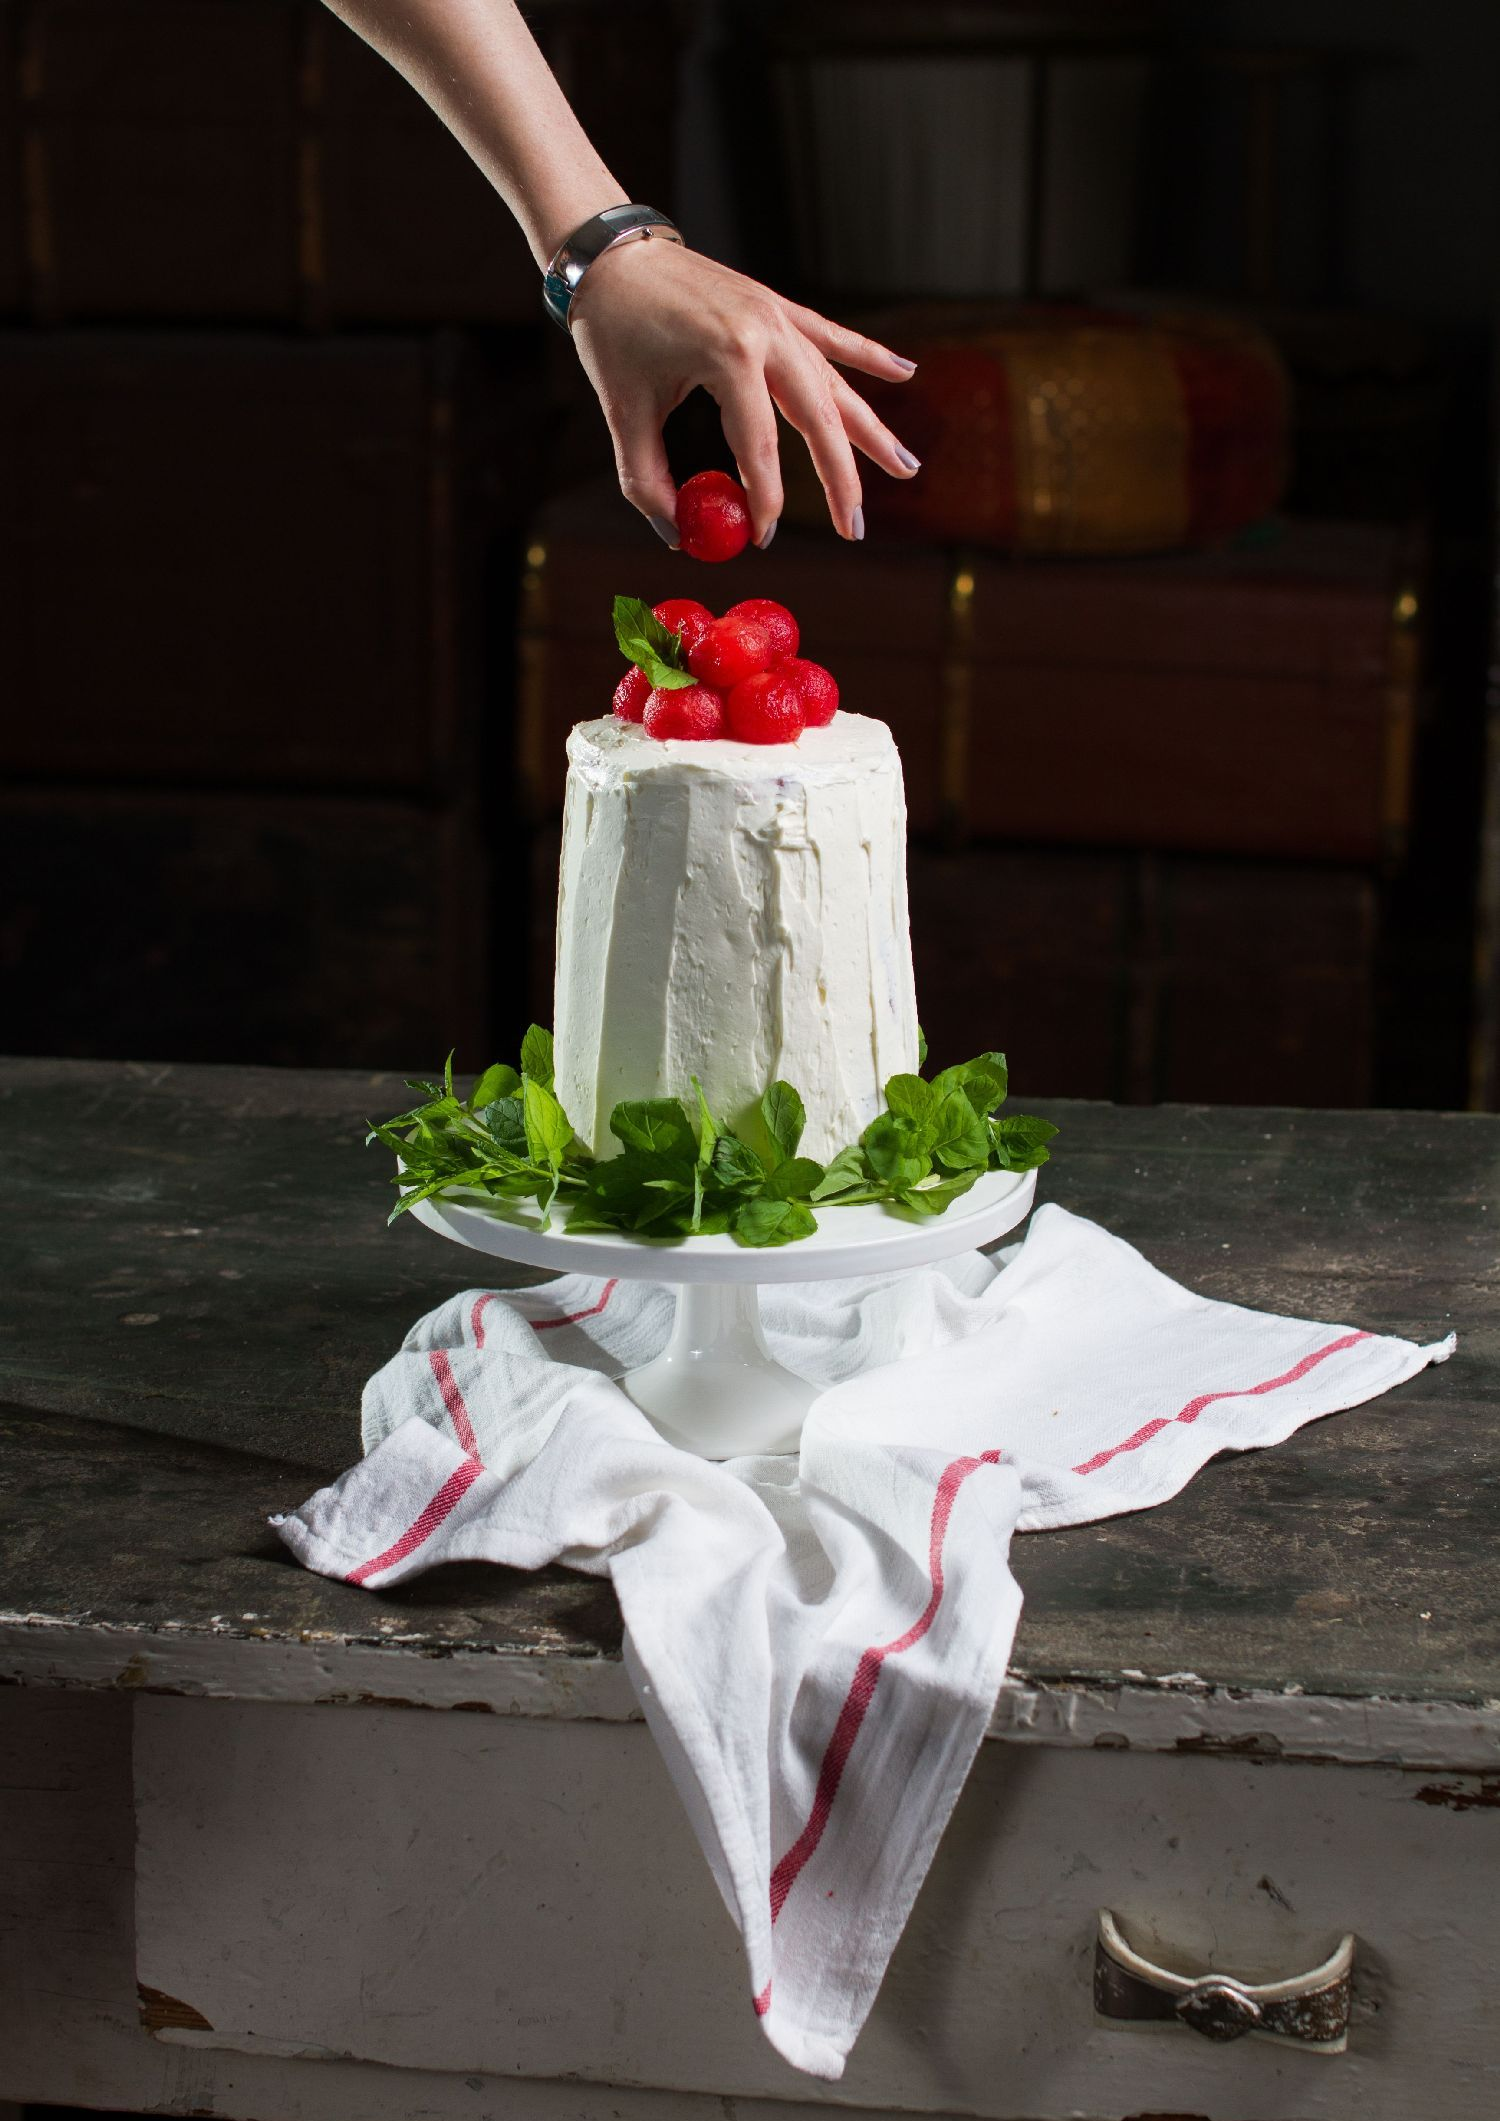 tort arbuzowy (1)